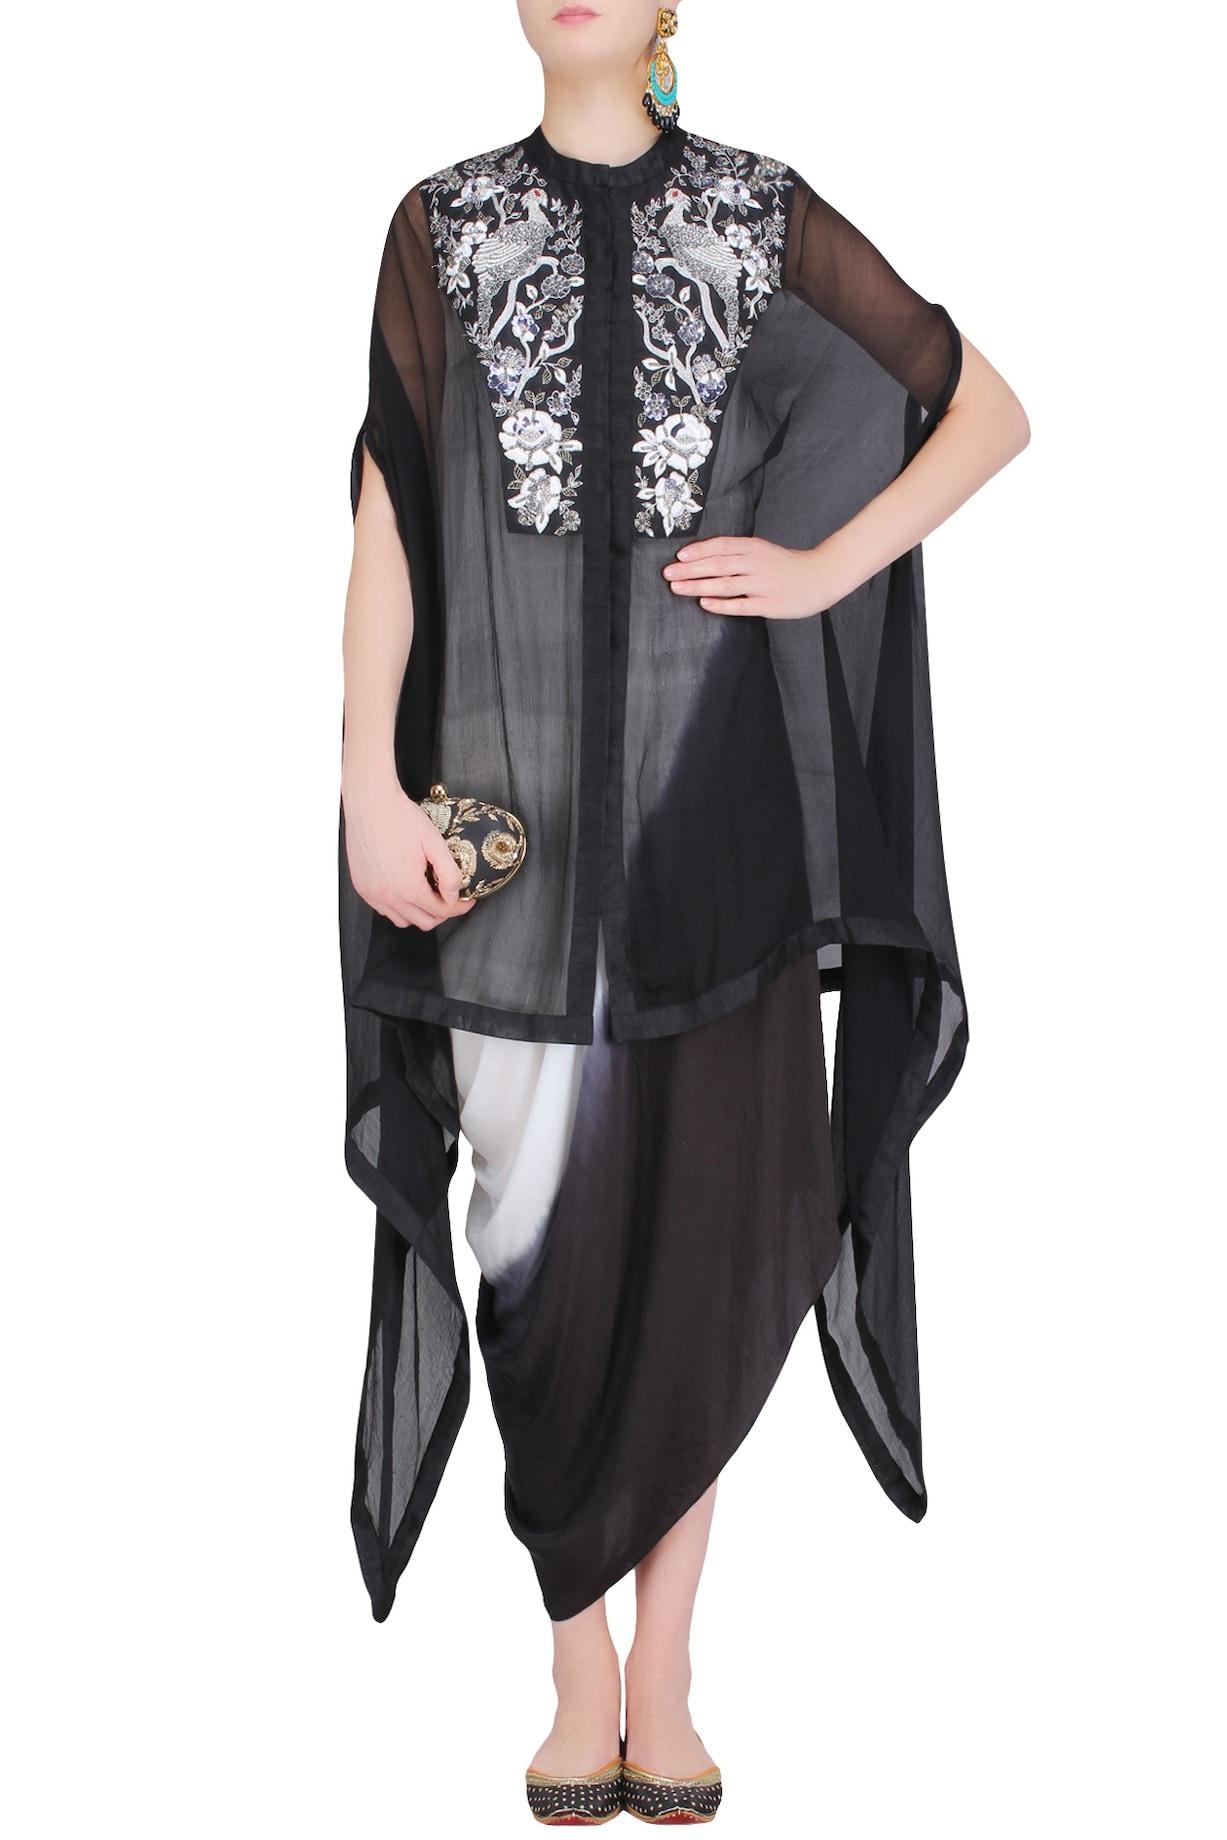 Roshni Chopra Dresses